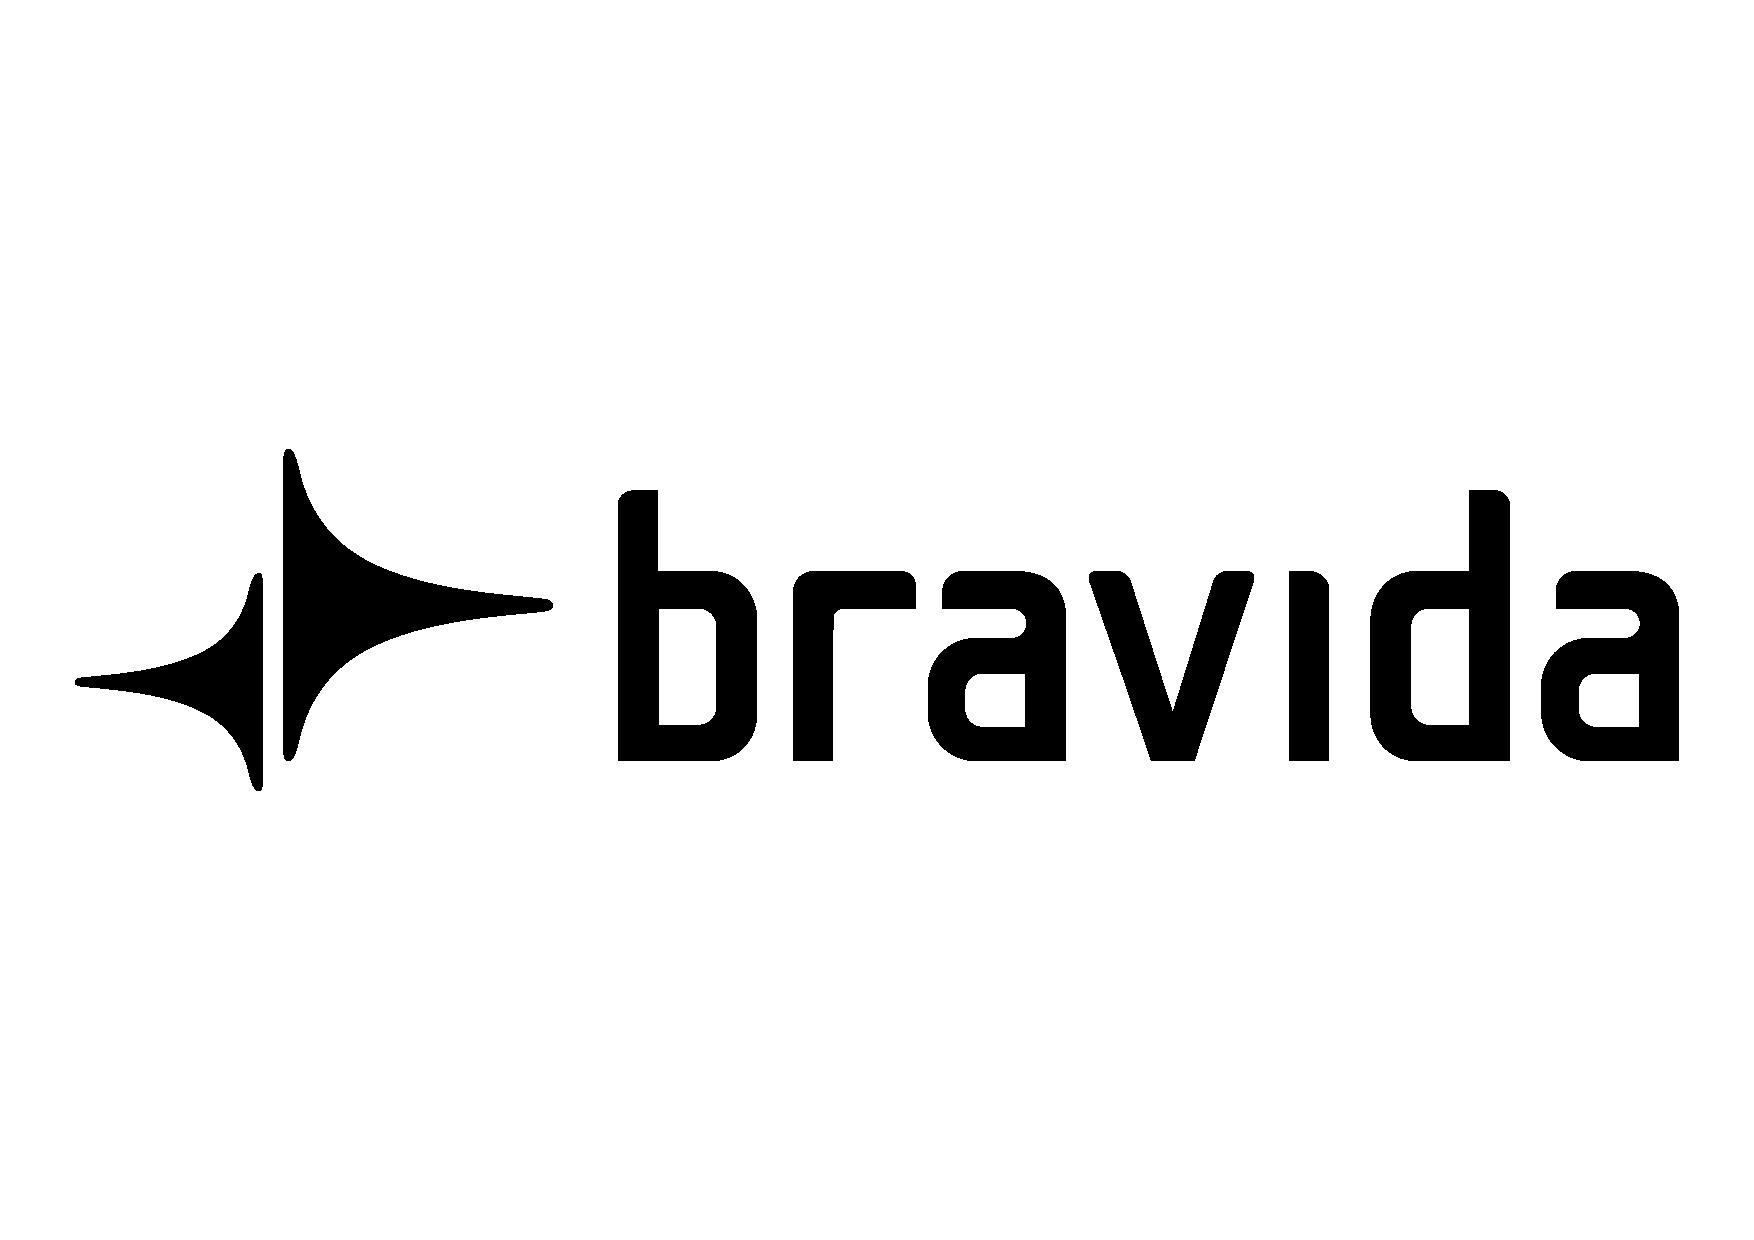 Bravida